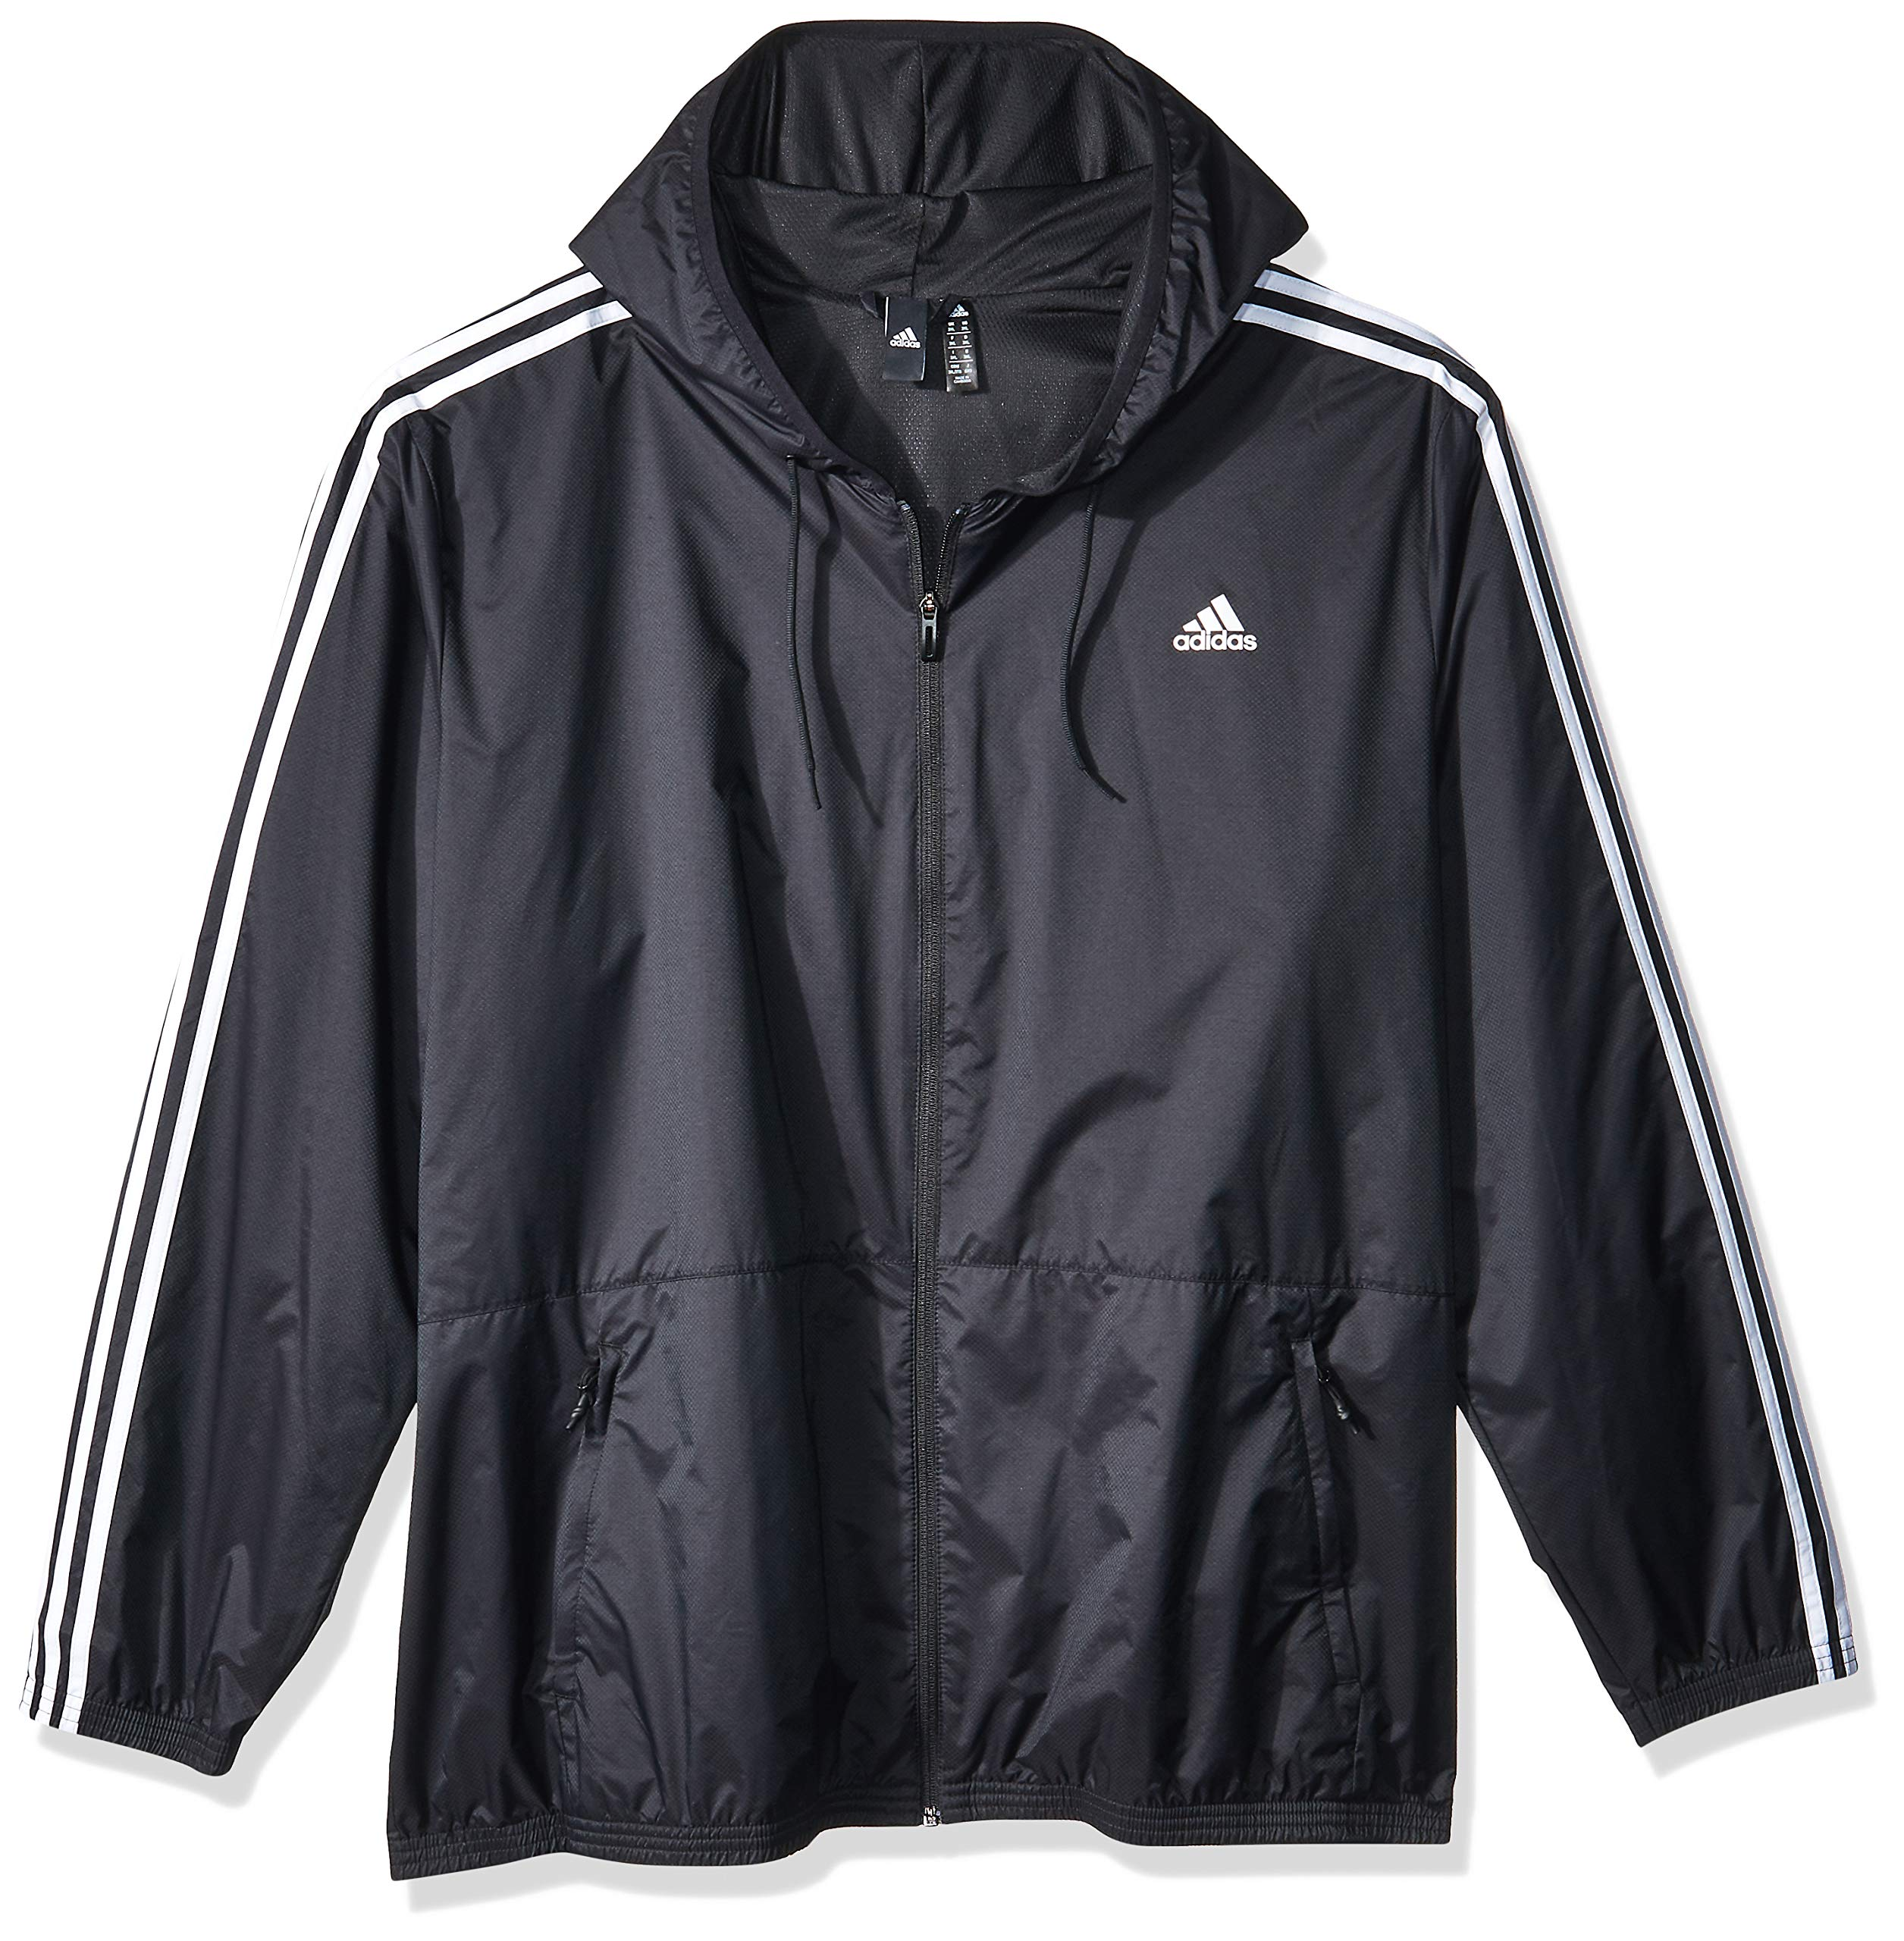 adidas Men's Essentials Wind Jacket, Black/Black/White, 3X-Large by adidas